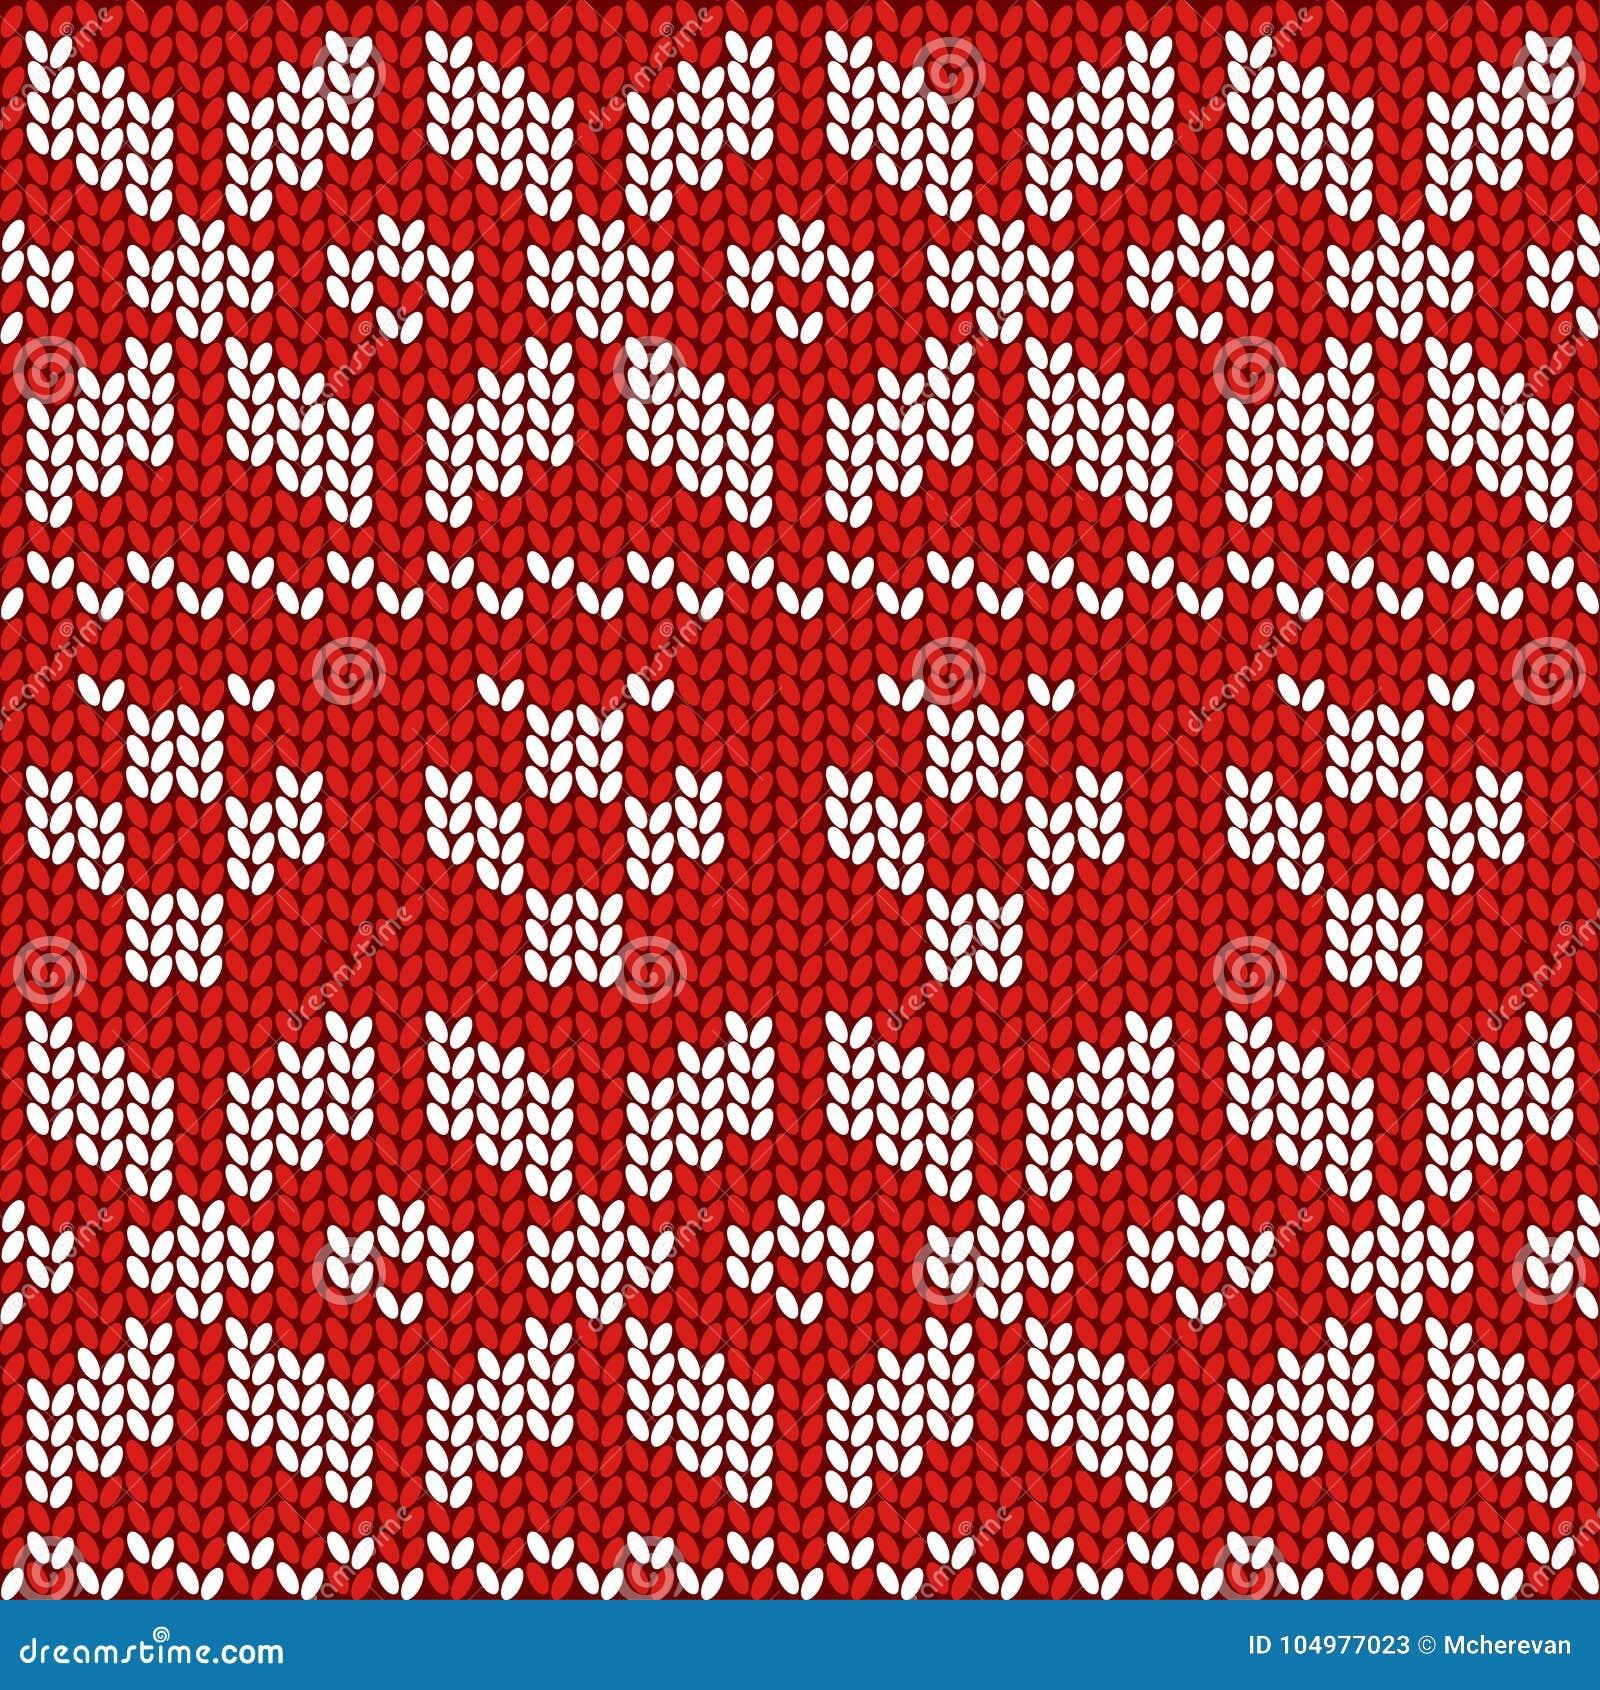 47b73e3fd Red and White Christmas Festive Sweater Fairisle Design. Knitting Pattern  for Winter Designs.